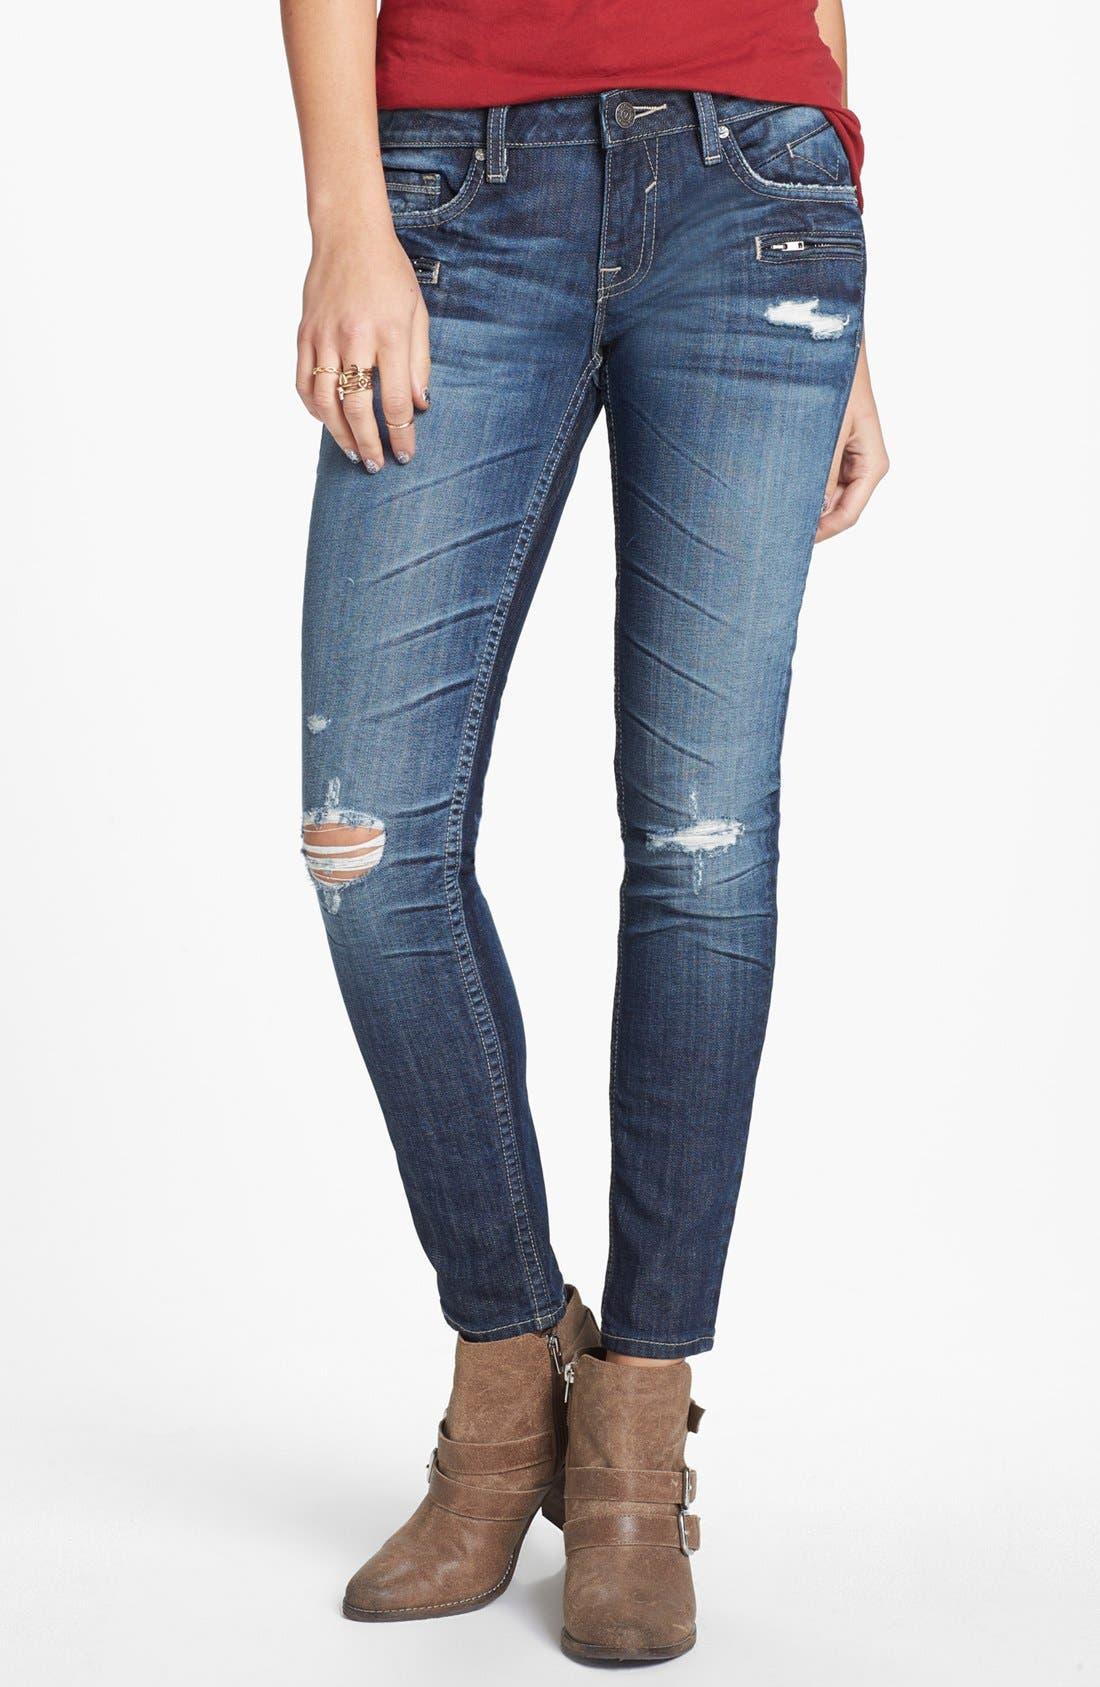 Main Image - Vigoss Deconstructed Skinny Jeans (Dark Wash) (Juniors) (Online Only)